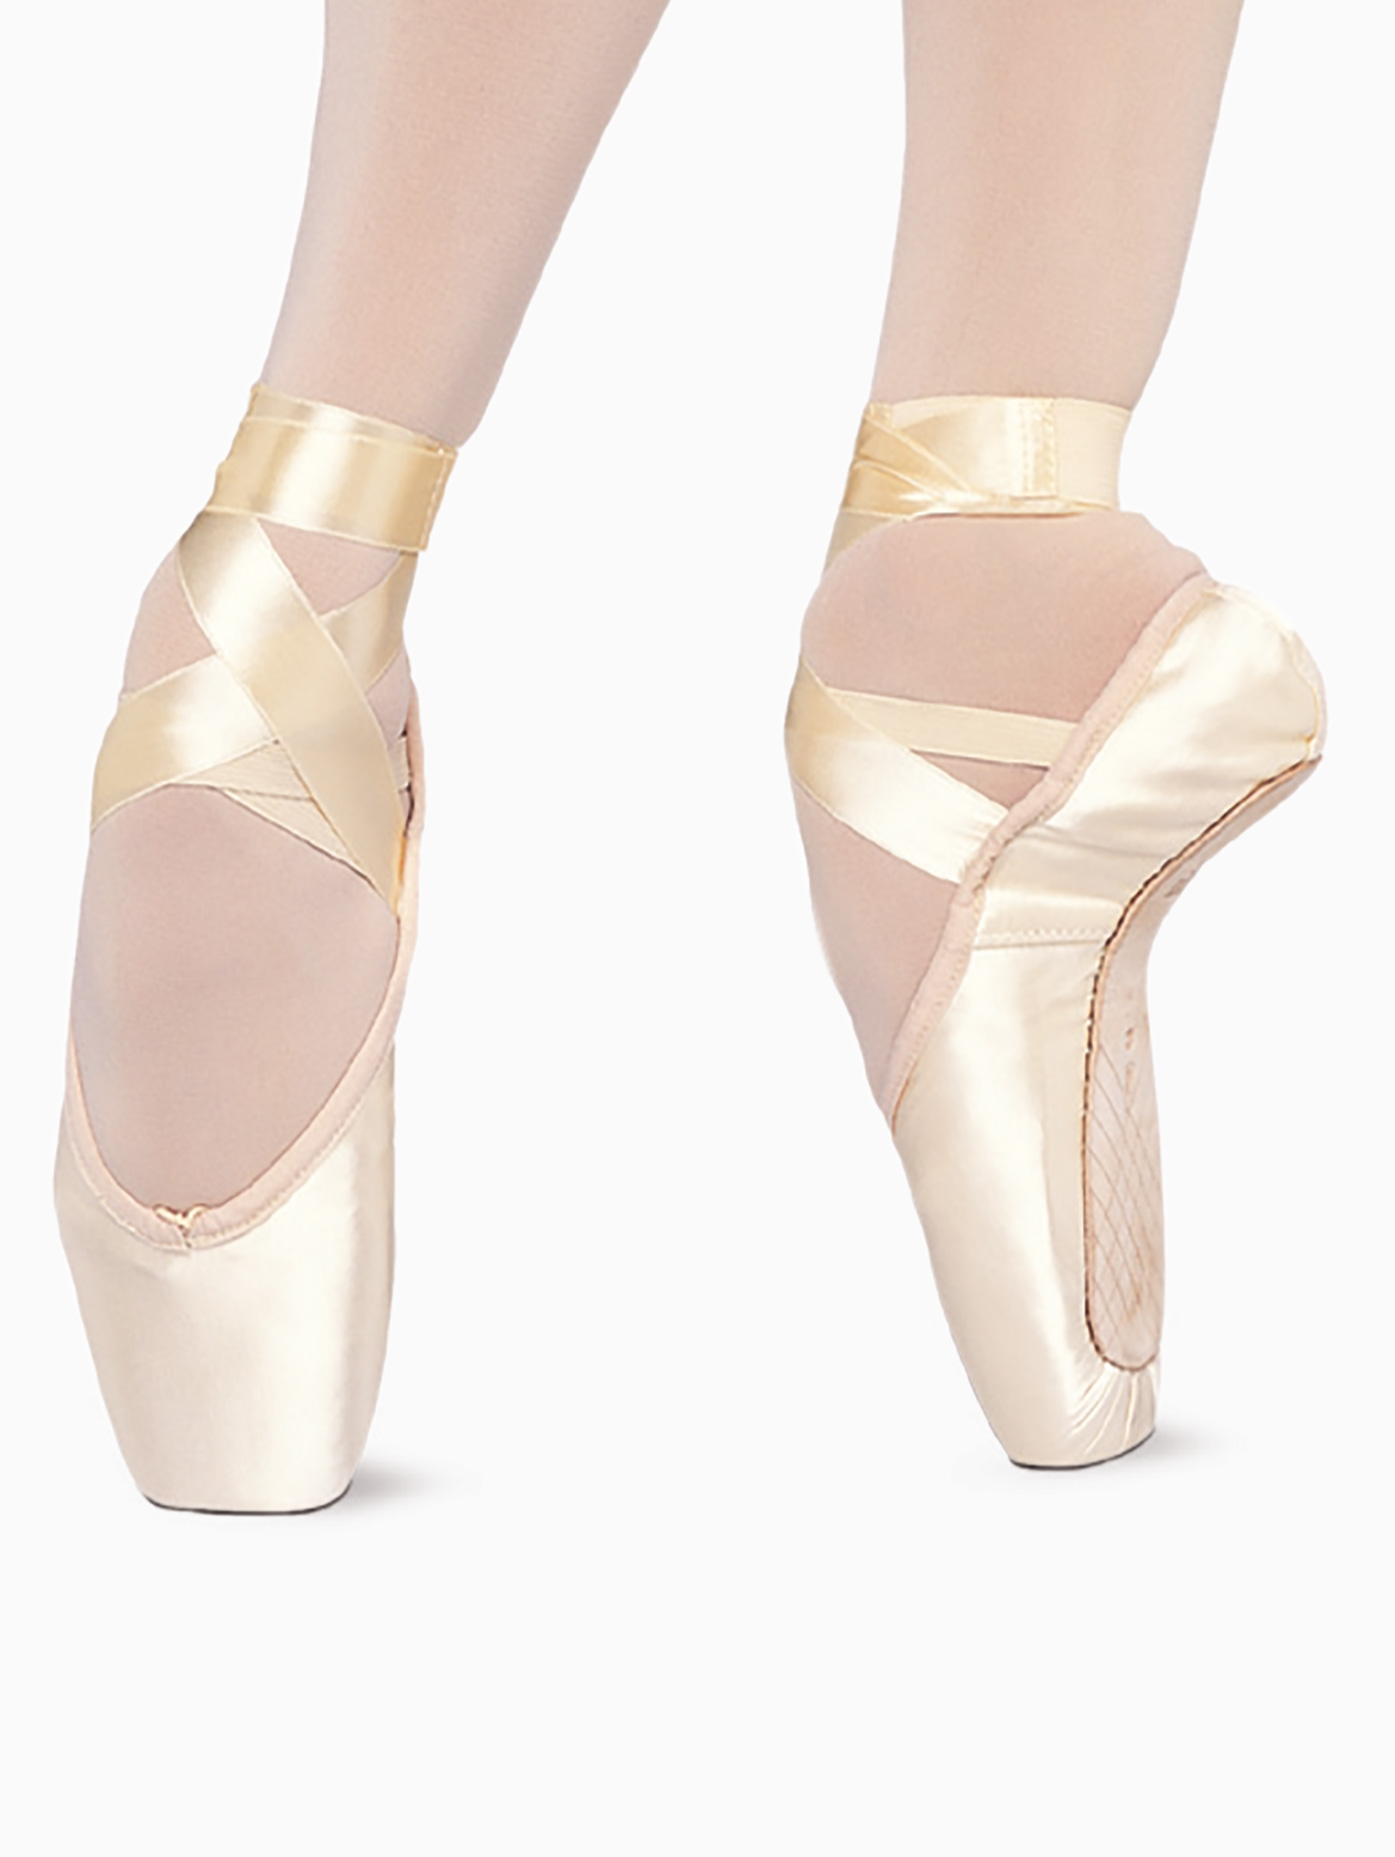 Bloch Adult 'Serenade' Pointe Shoes S0131